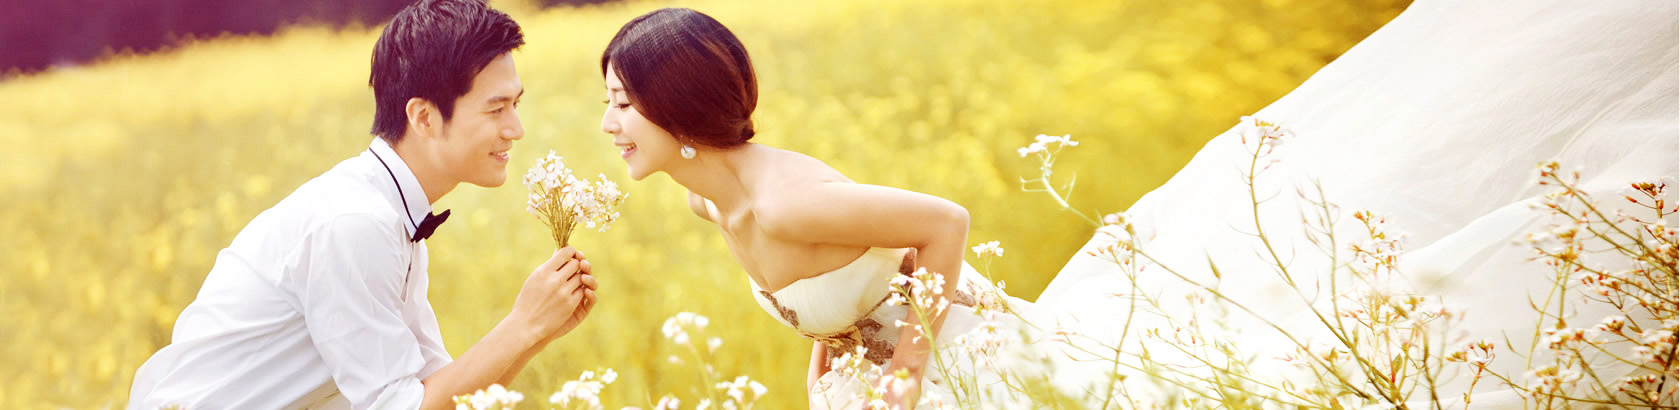 葫芦岛婚纱摄影